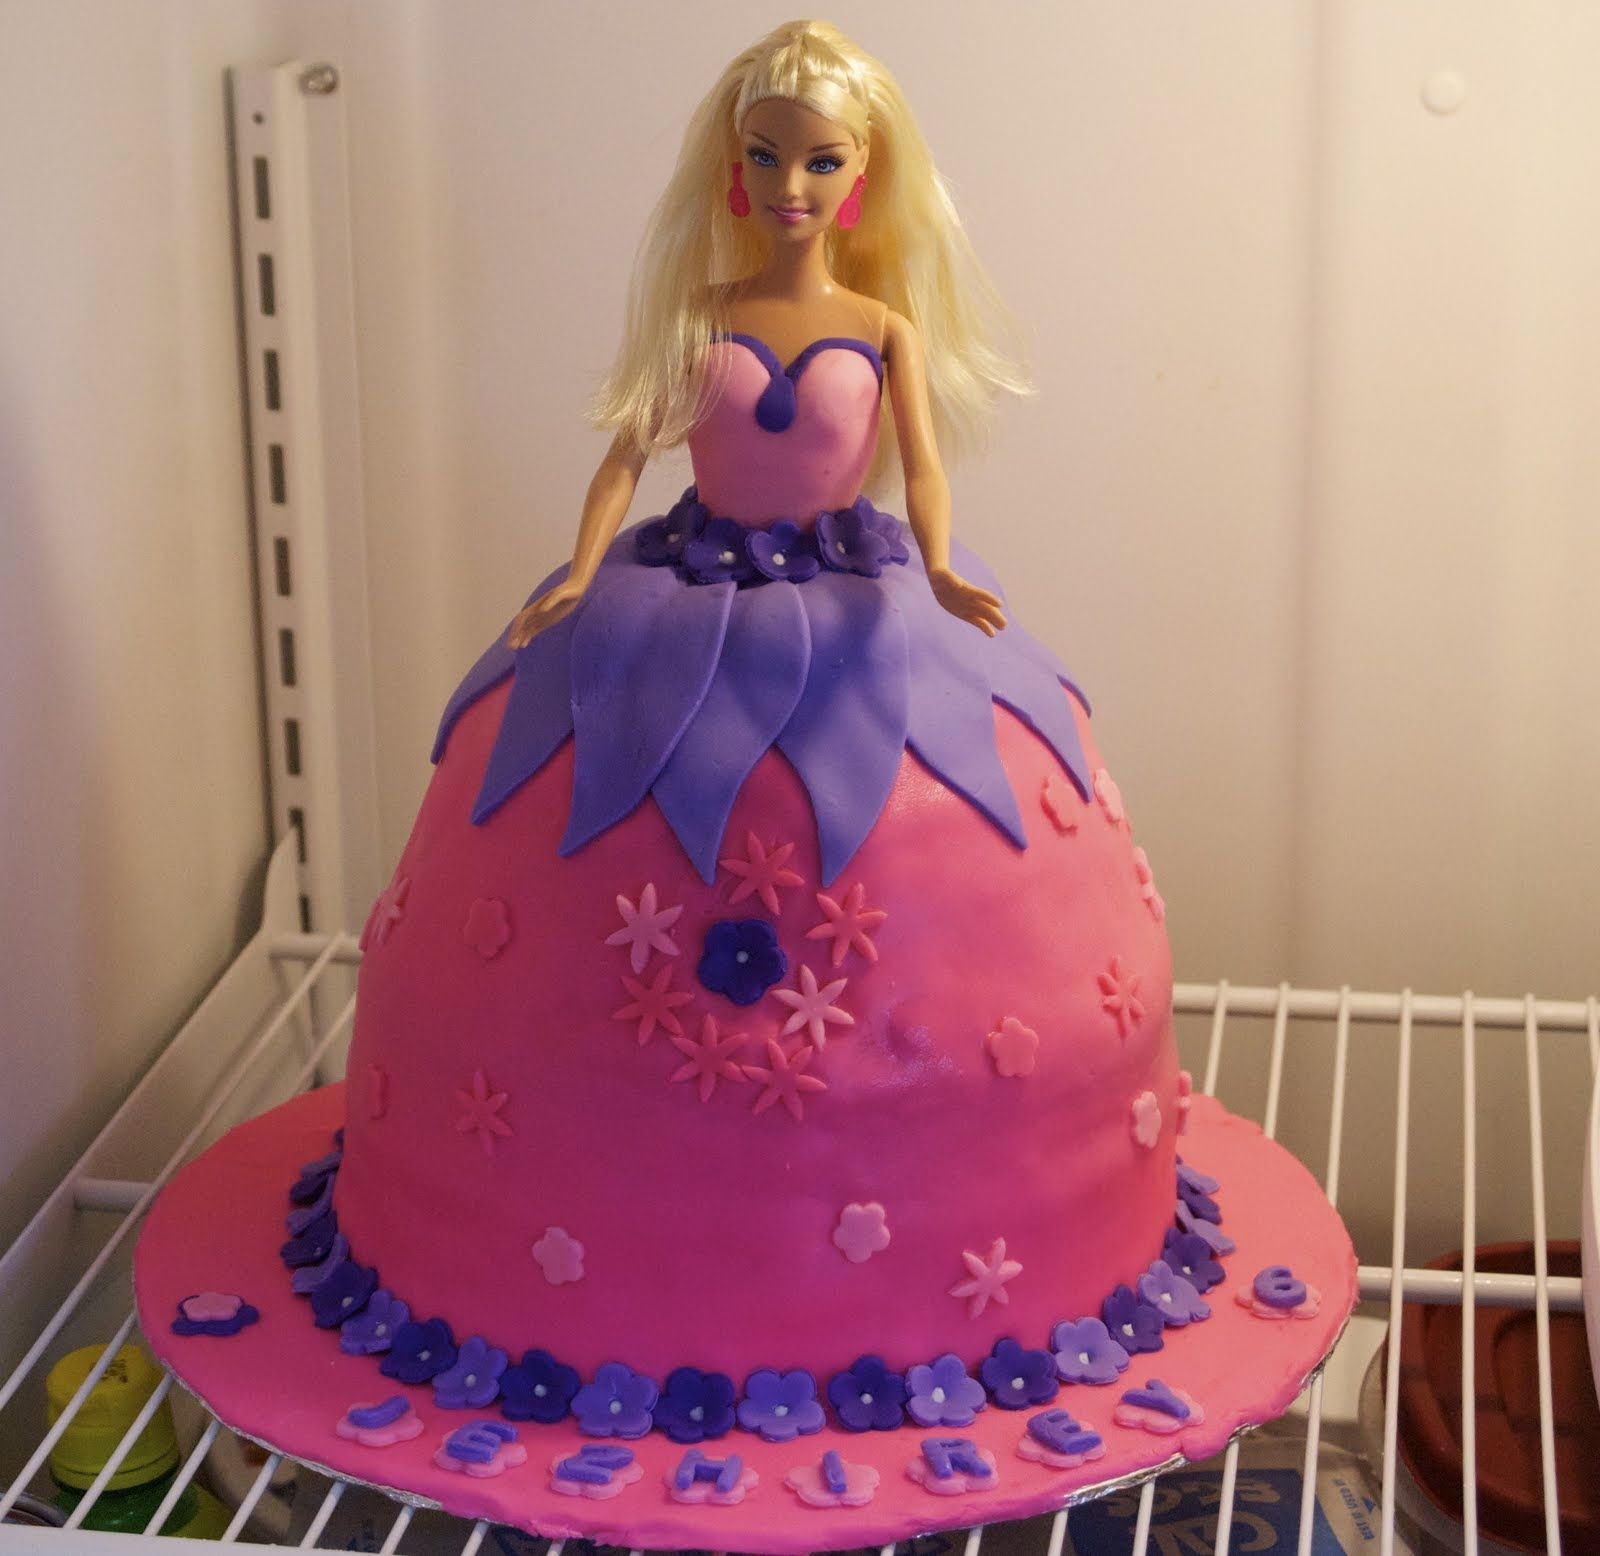 Barbie Doll Cake Recipe Barbi Pinterest Cake Barbie Cake And